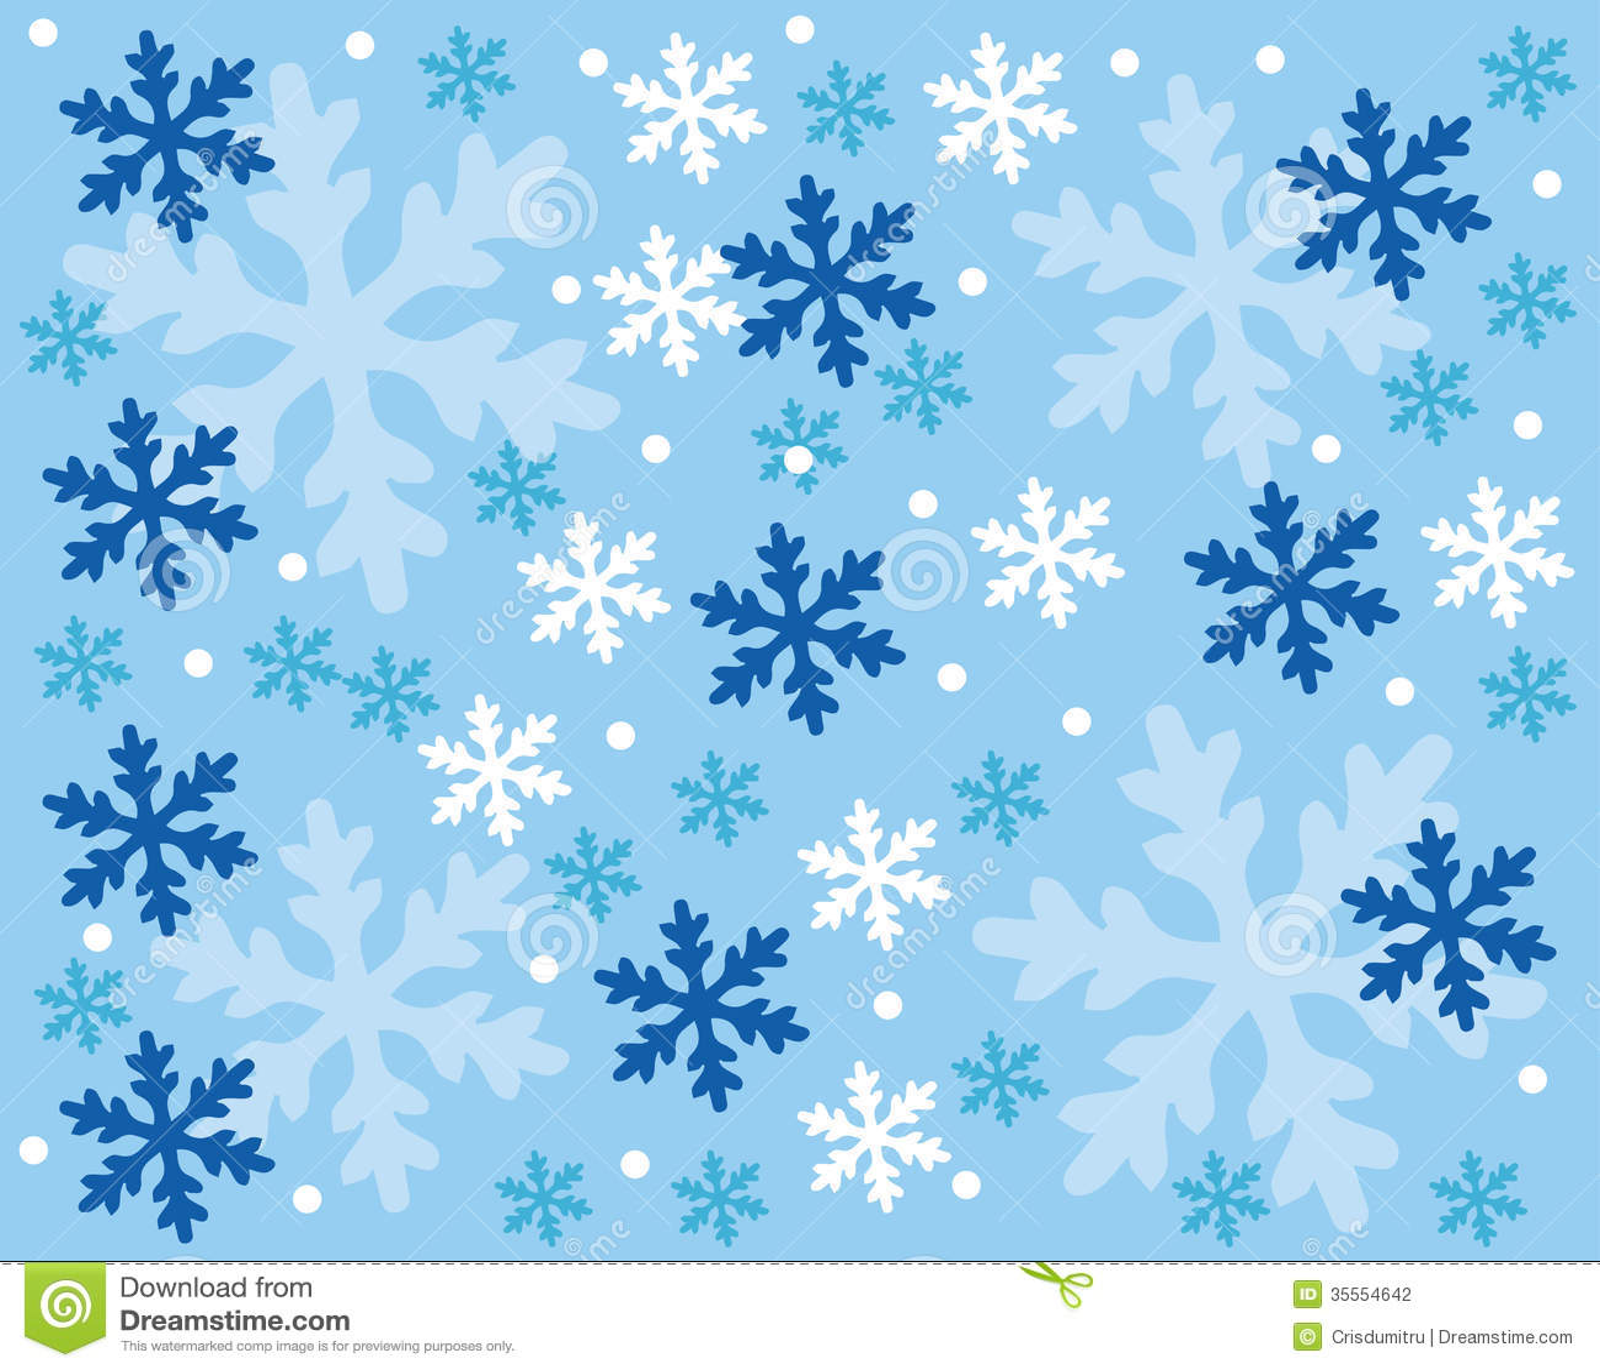 Snowflake Pattern Stock Photography - Image: 35554642